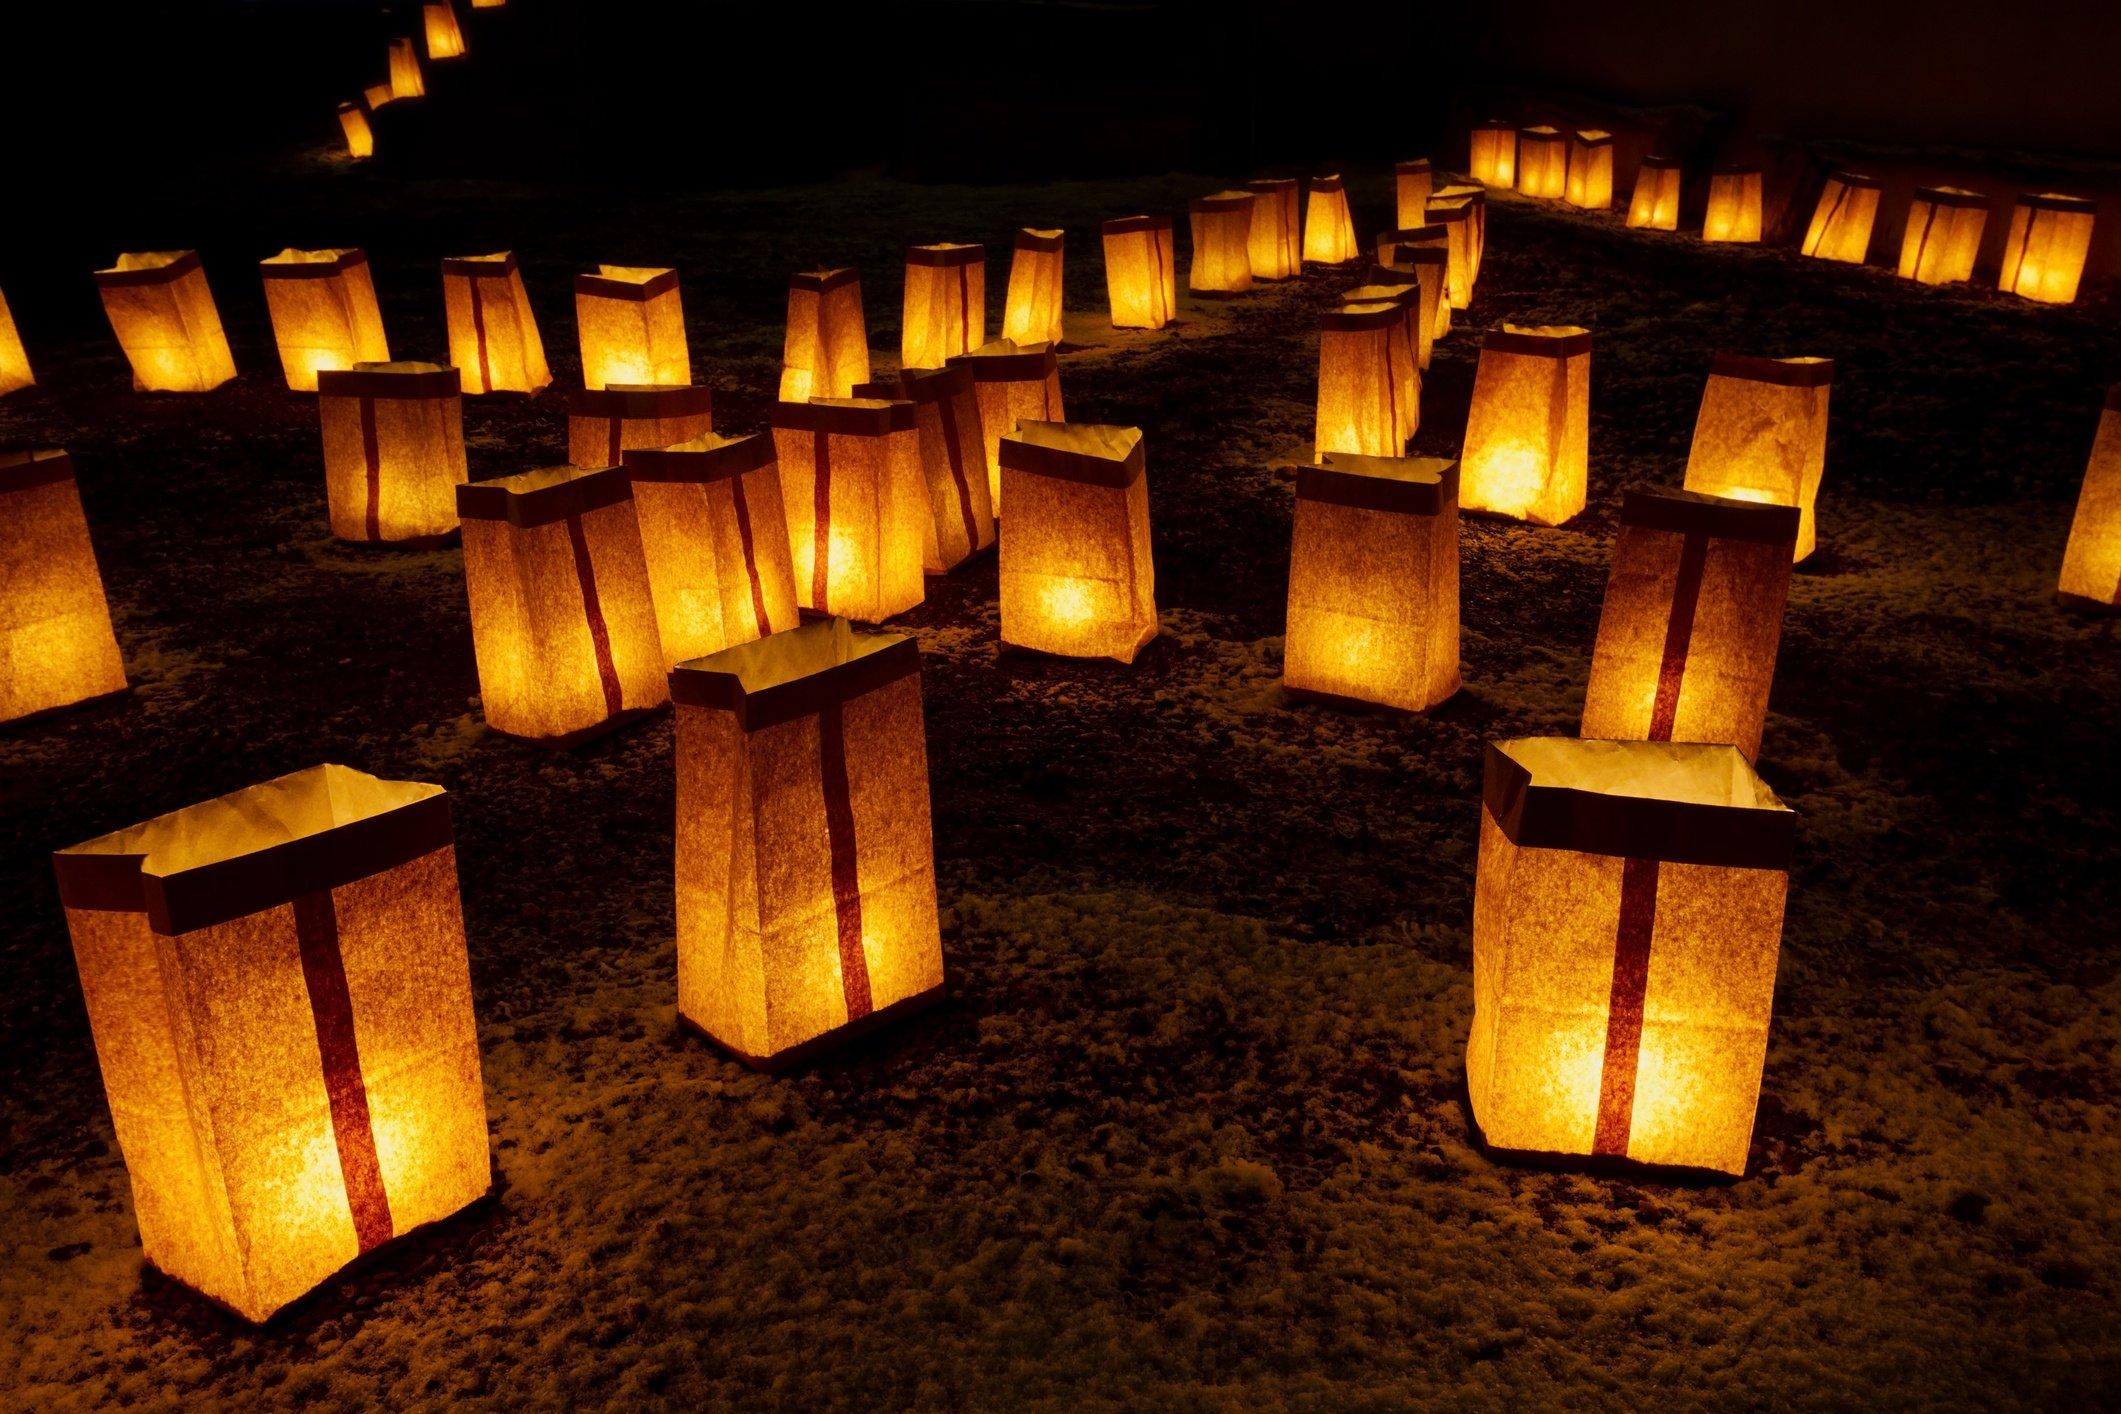 November 7 | Arbor Terrace Mountainside Luminaria Ceremony